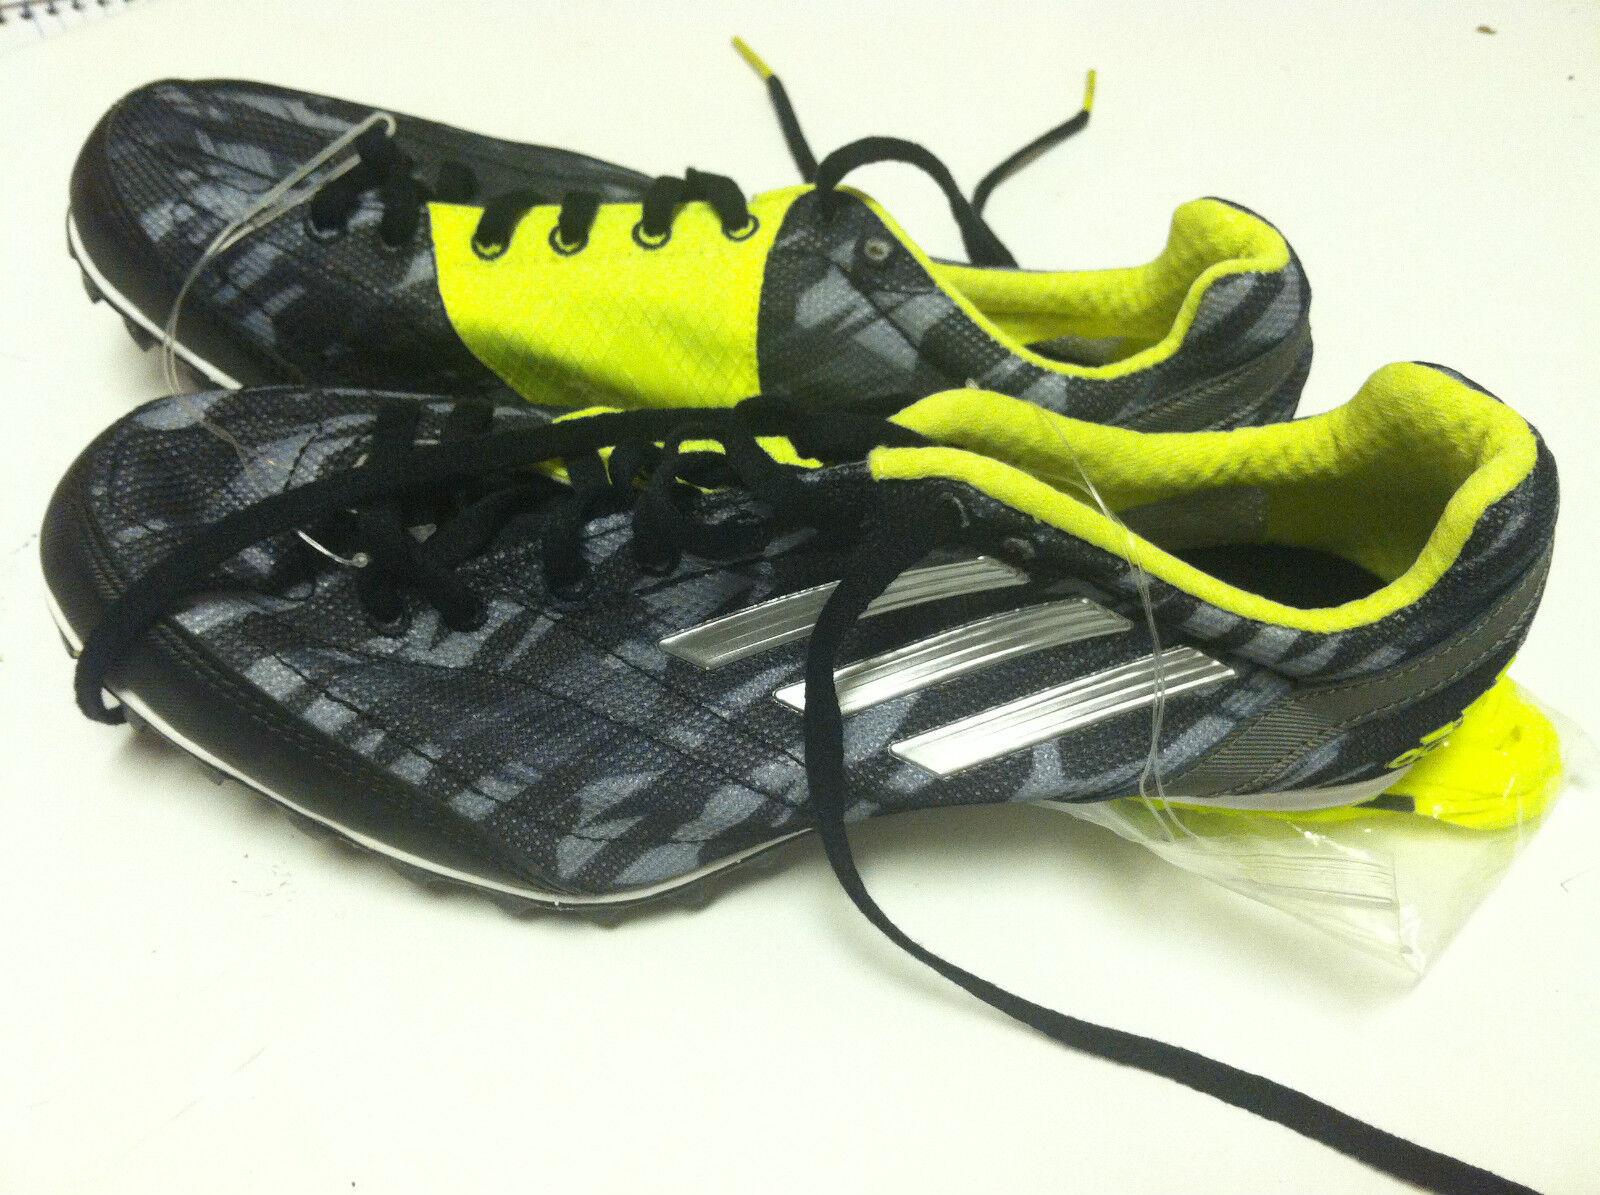 Adidas scarpe da ginnastica - grigio / nero nwob - sz 12 - nwob nero - b-sho-4 809be1